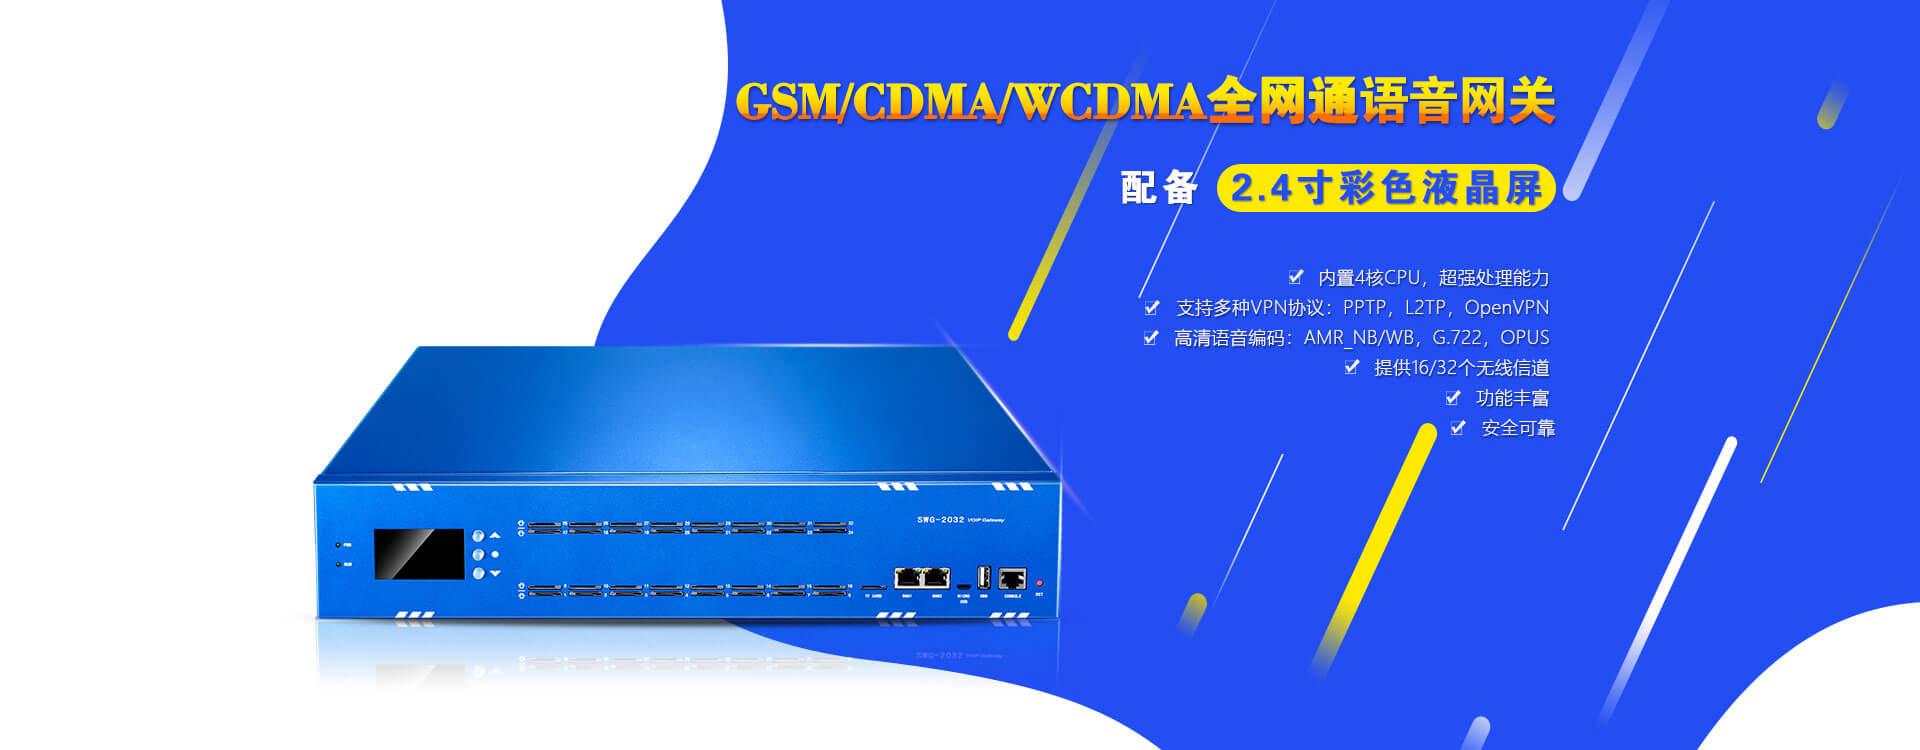 SWG-20XX-cn